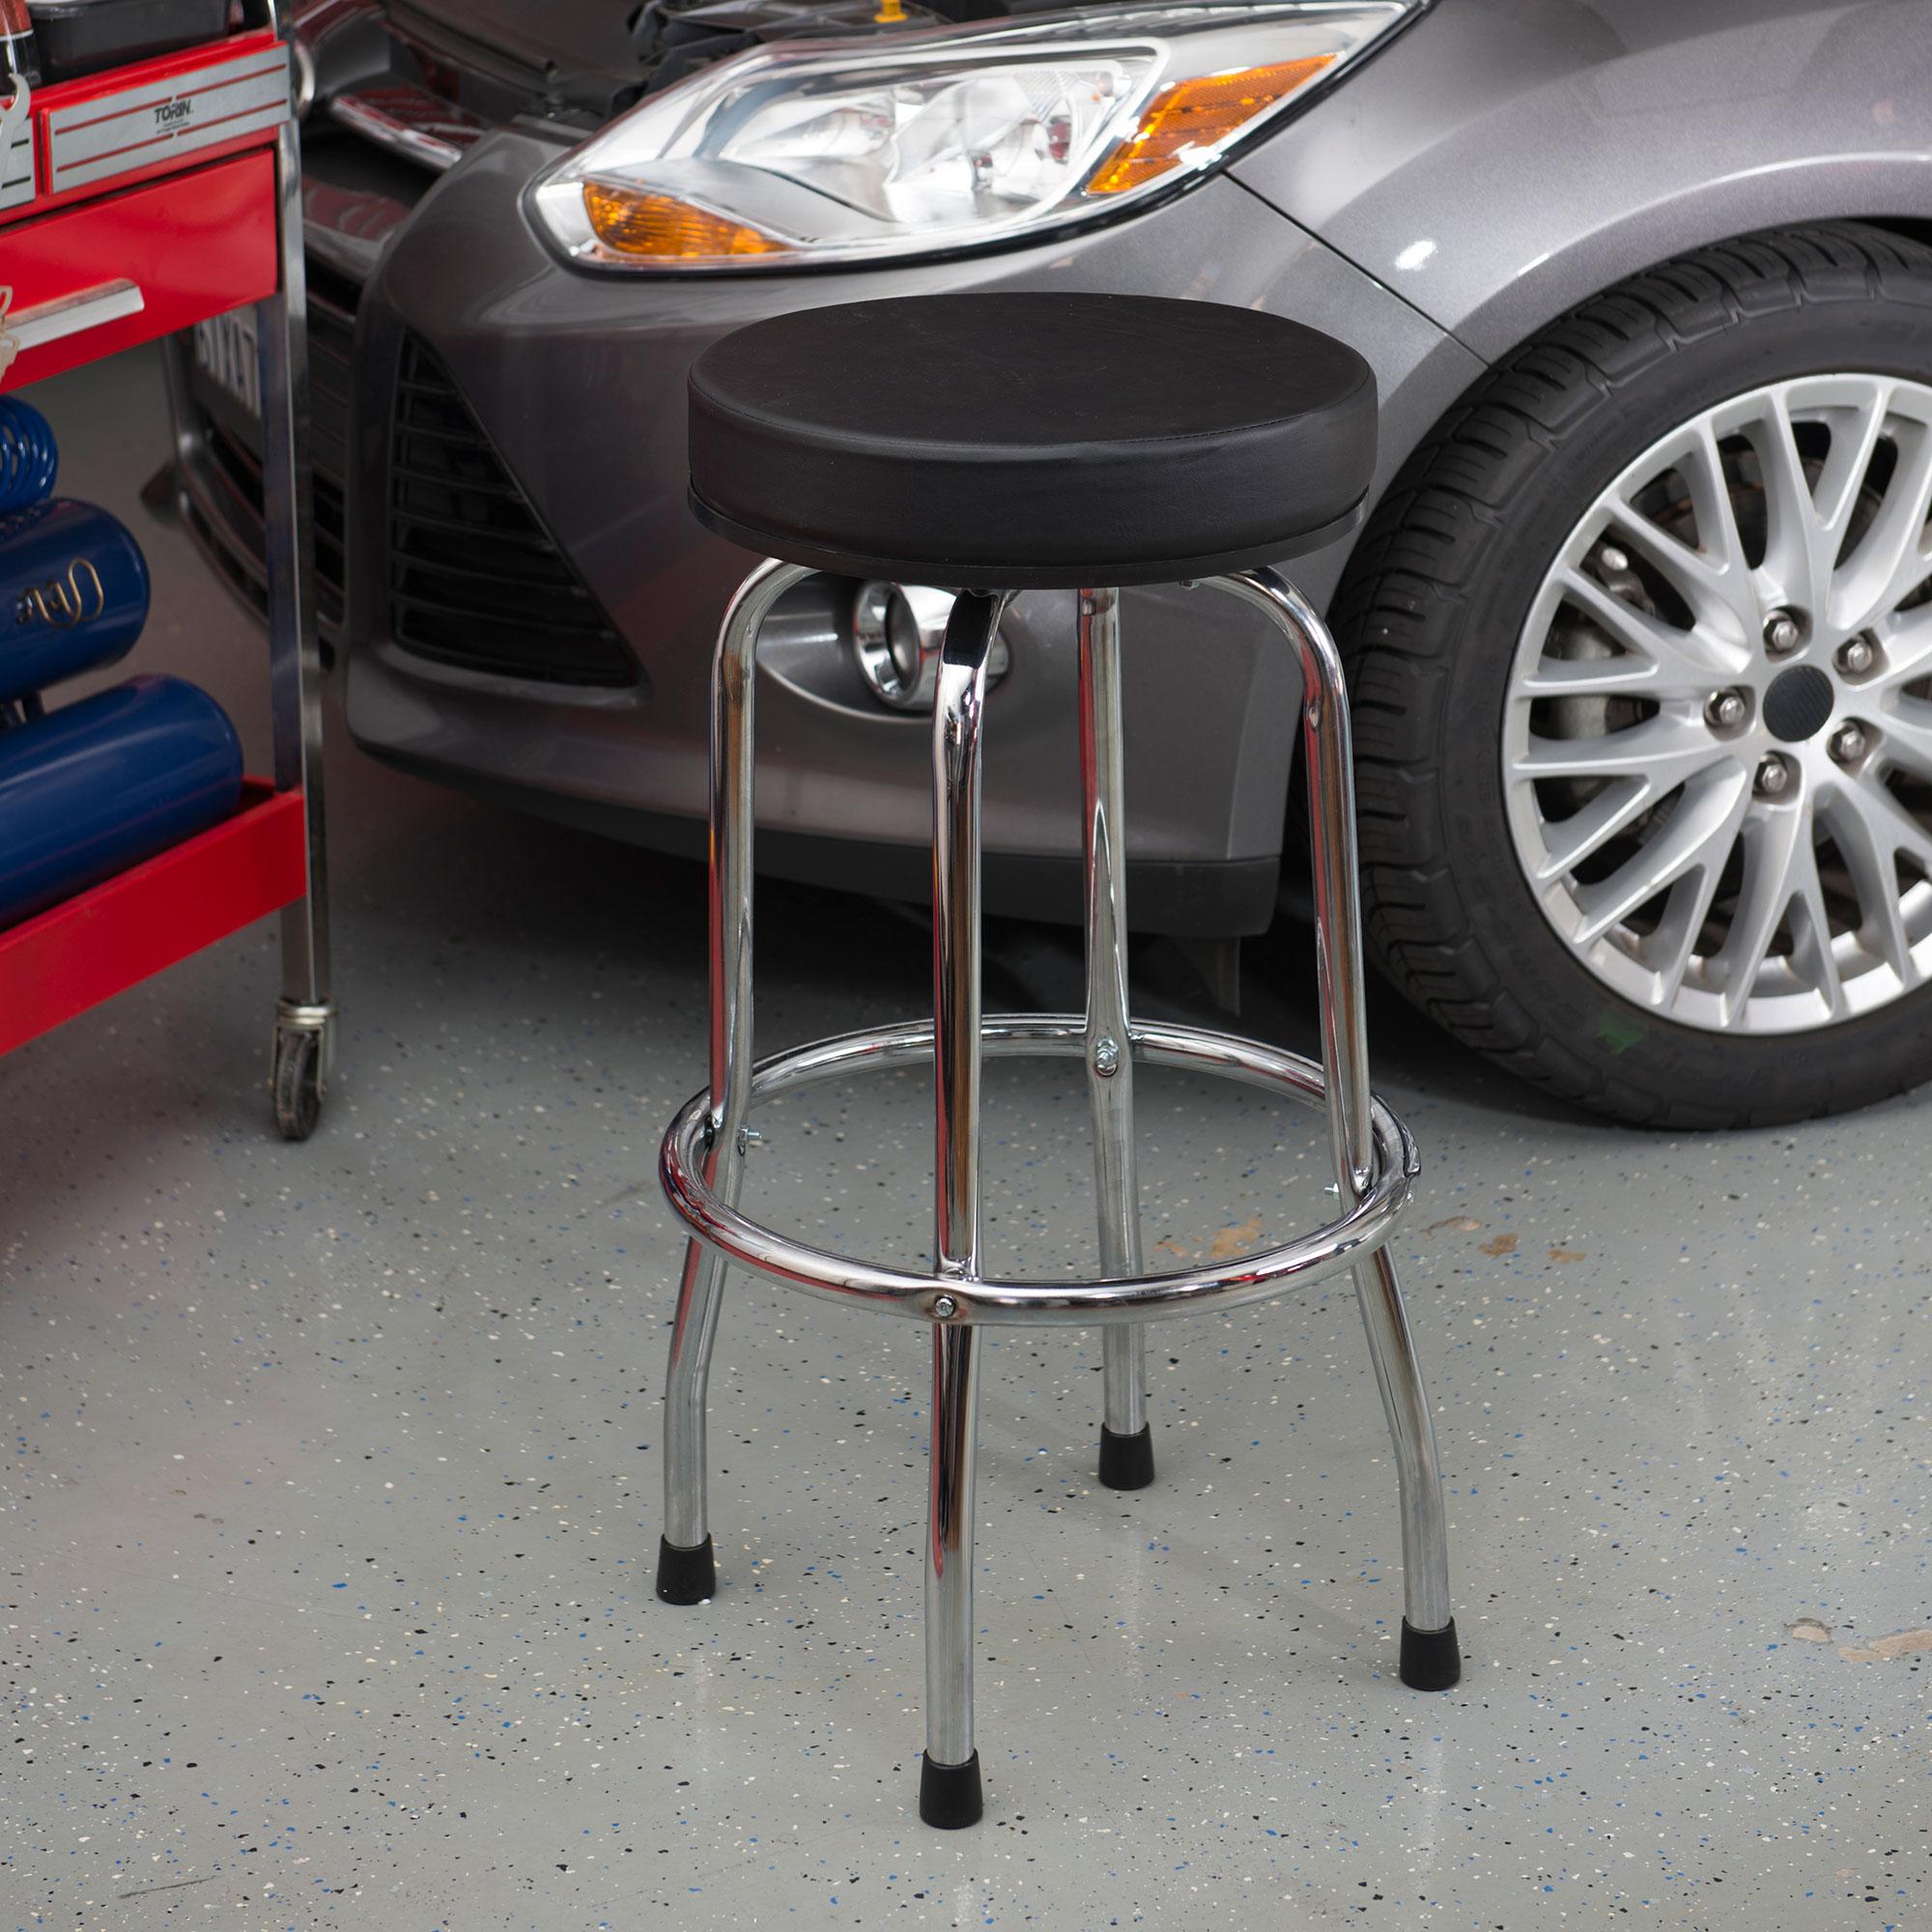 set stool dp modern automotive stools kitchen dining adjustable com of bar contemporary amazon